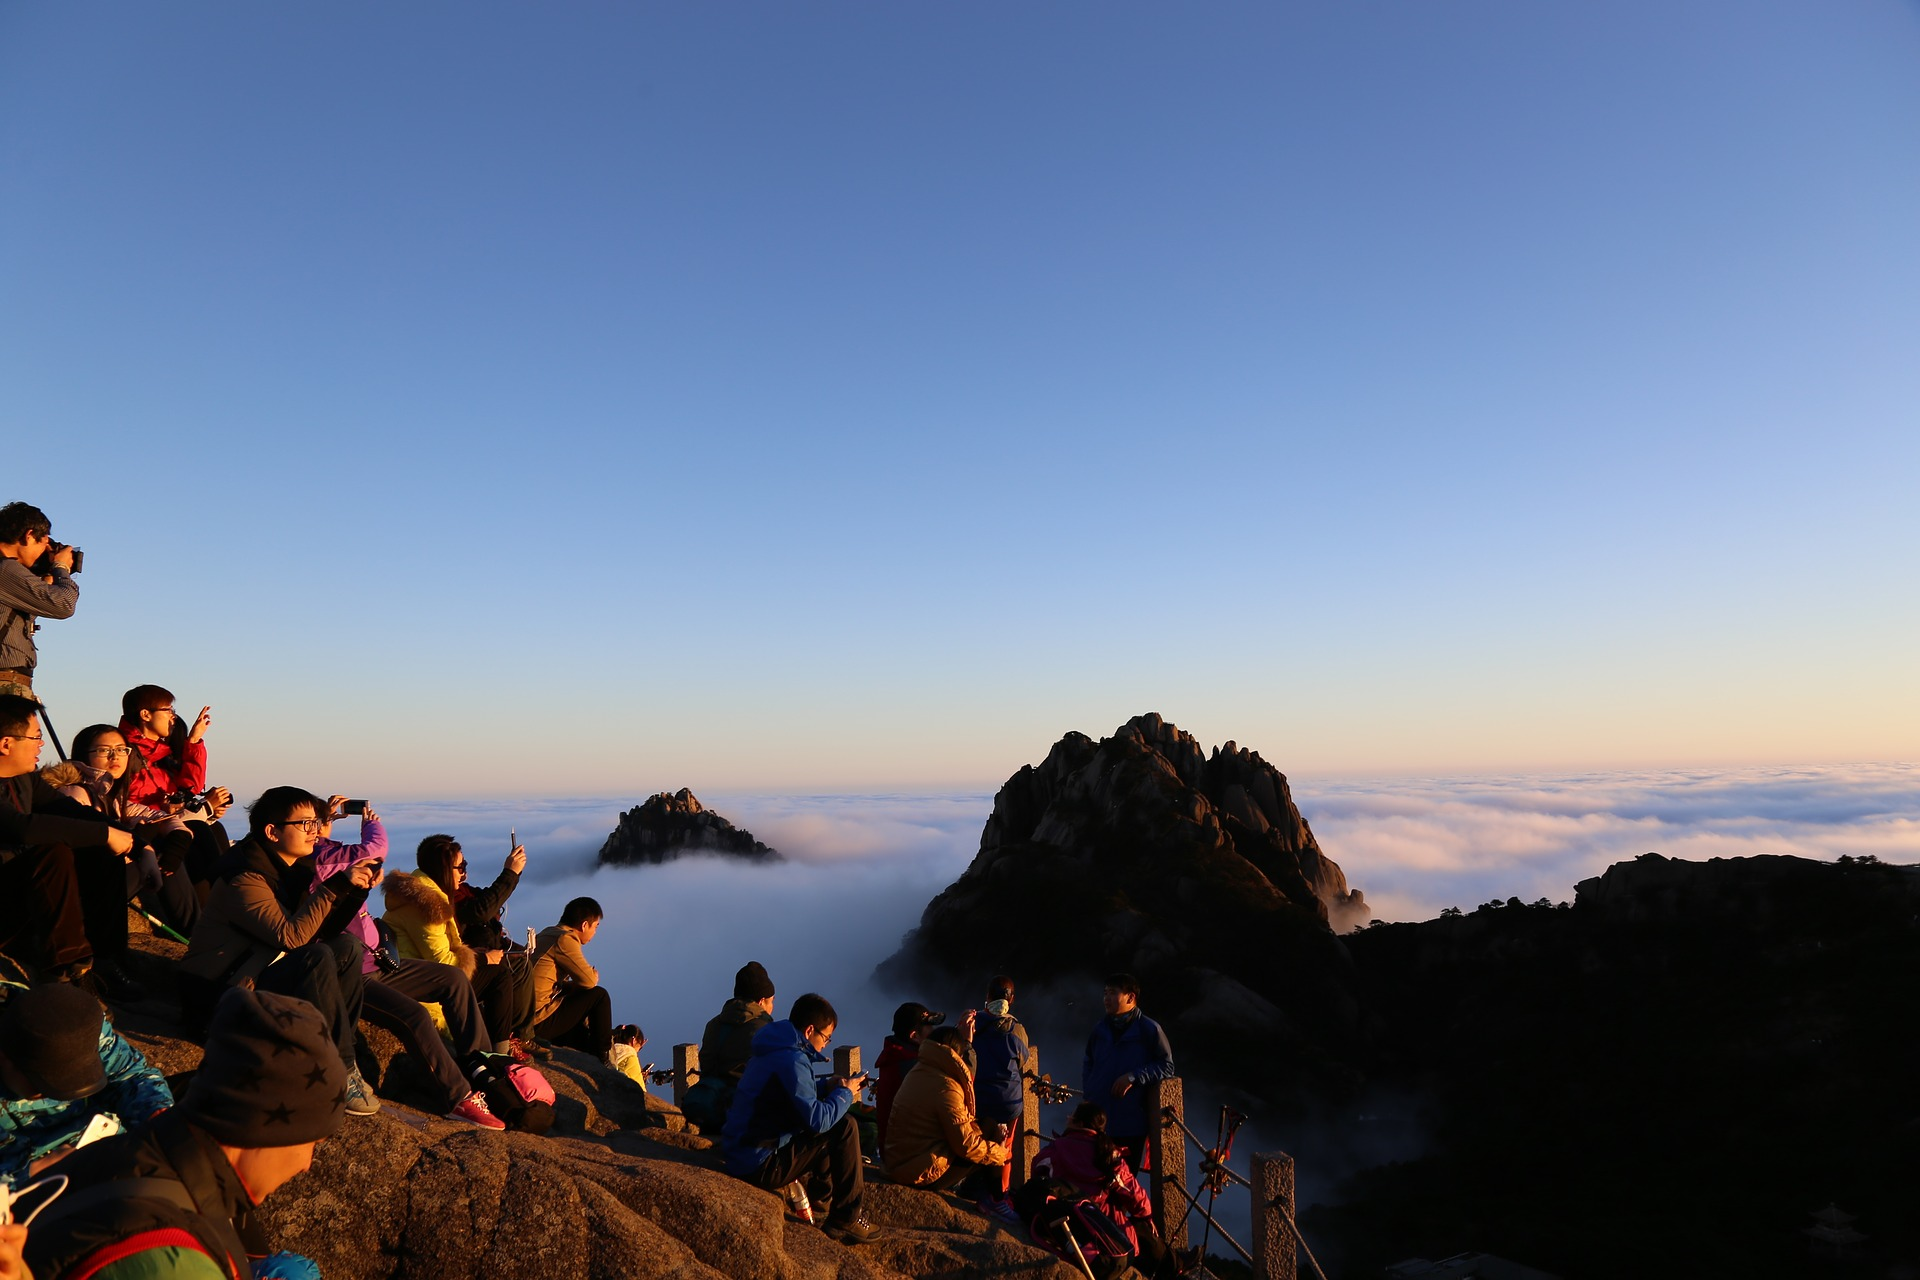 mountain-huangshan-sunrise.jpg